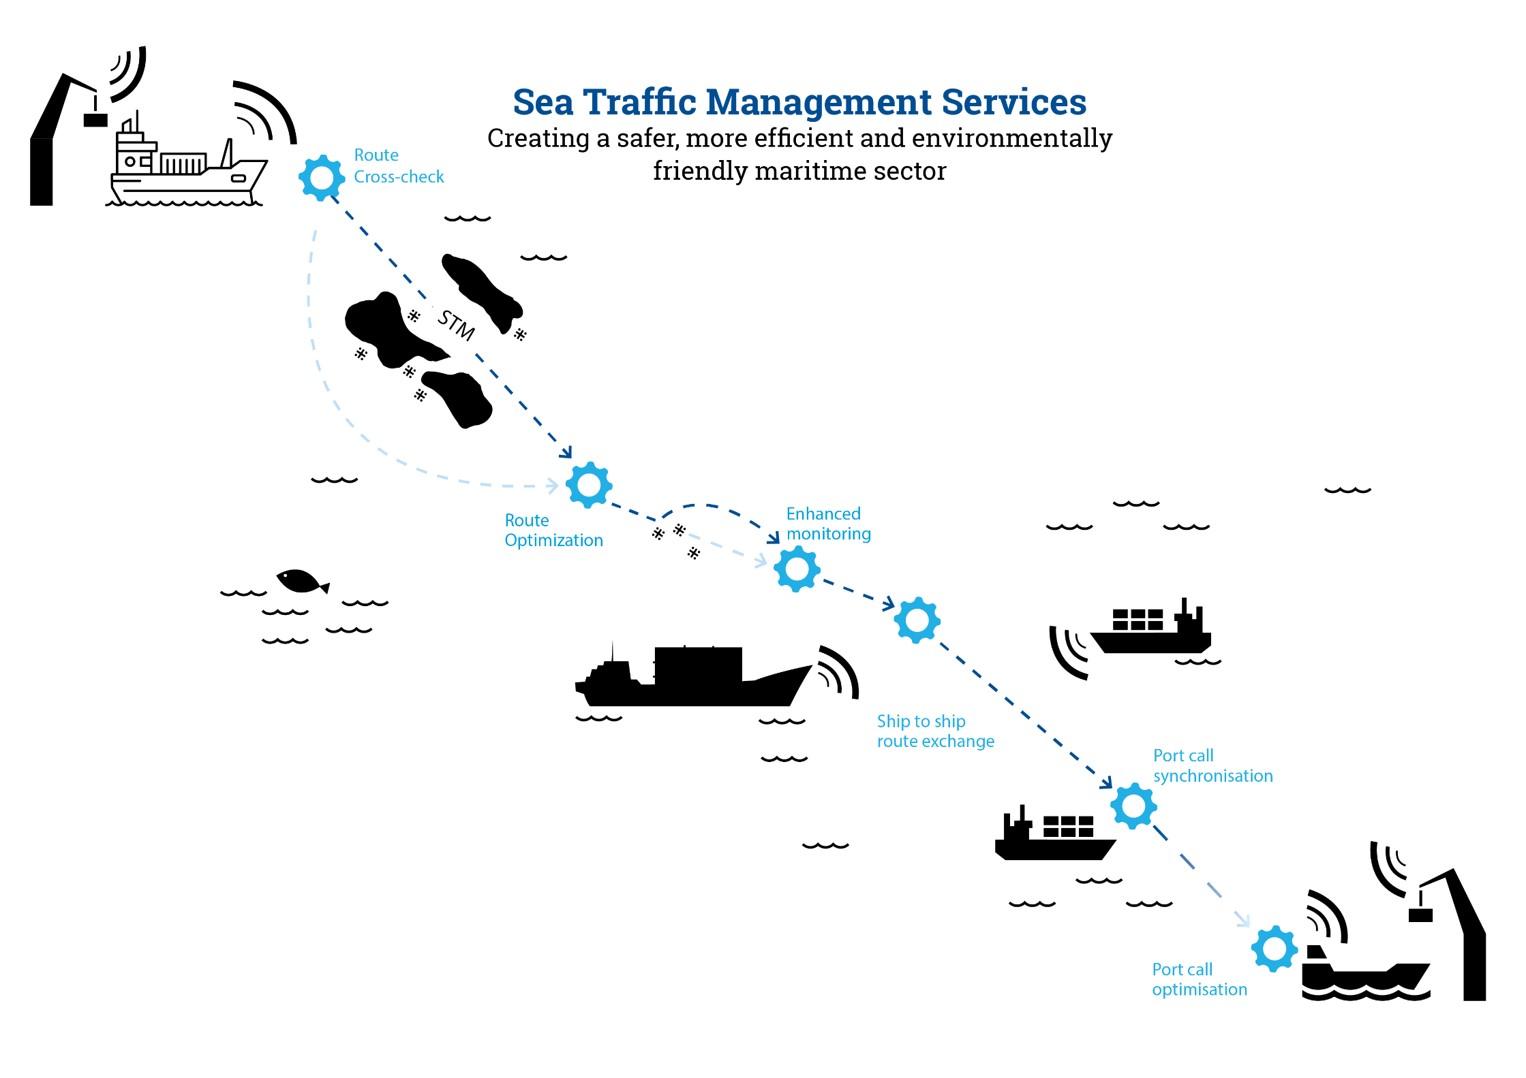 STM services